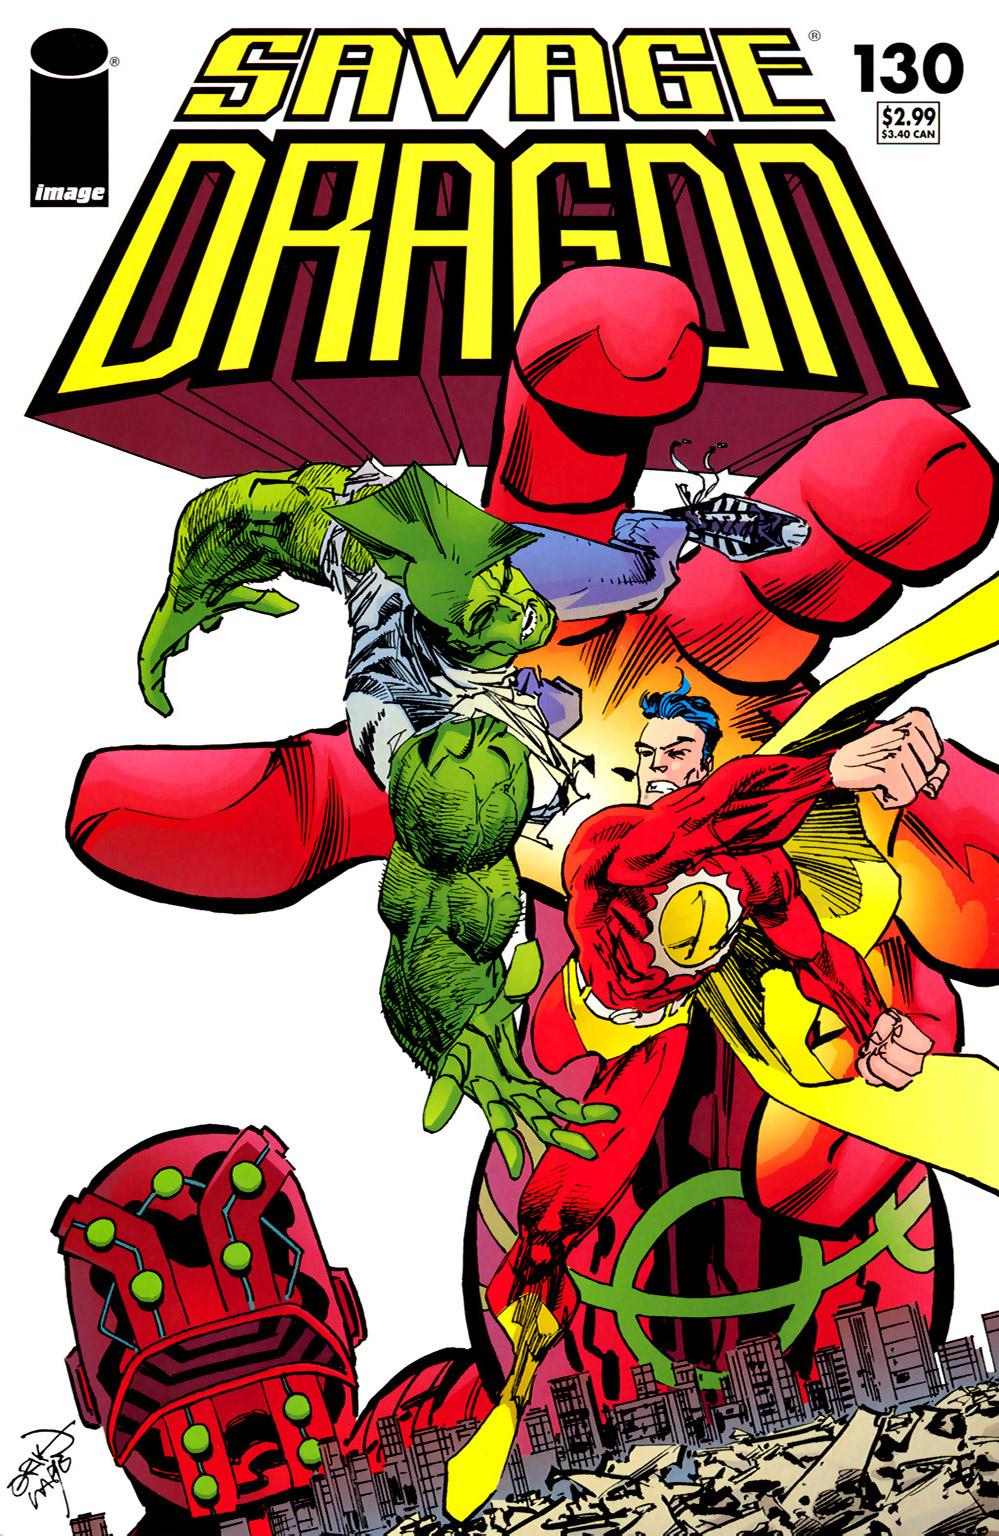 Cover Savage Dragon Vol.2 #130